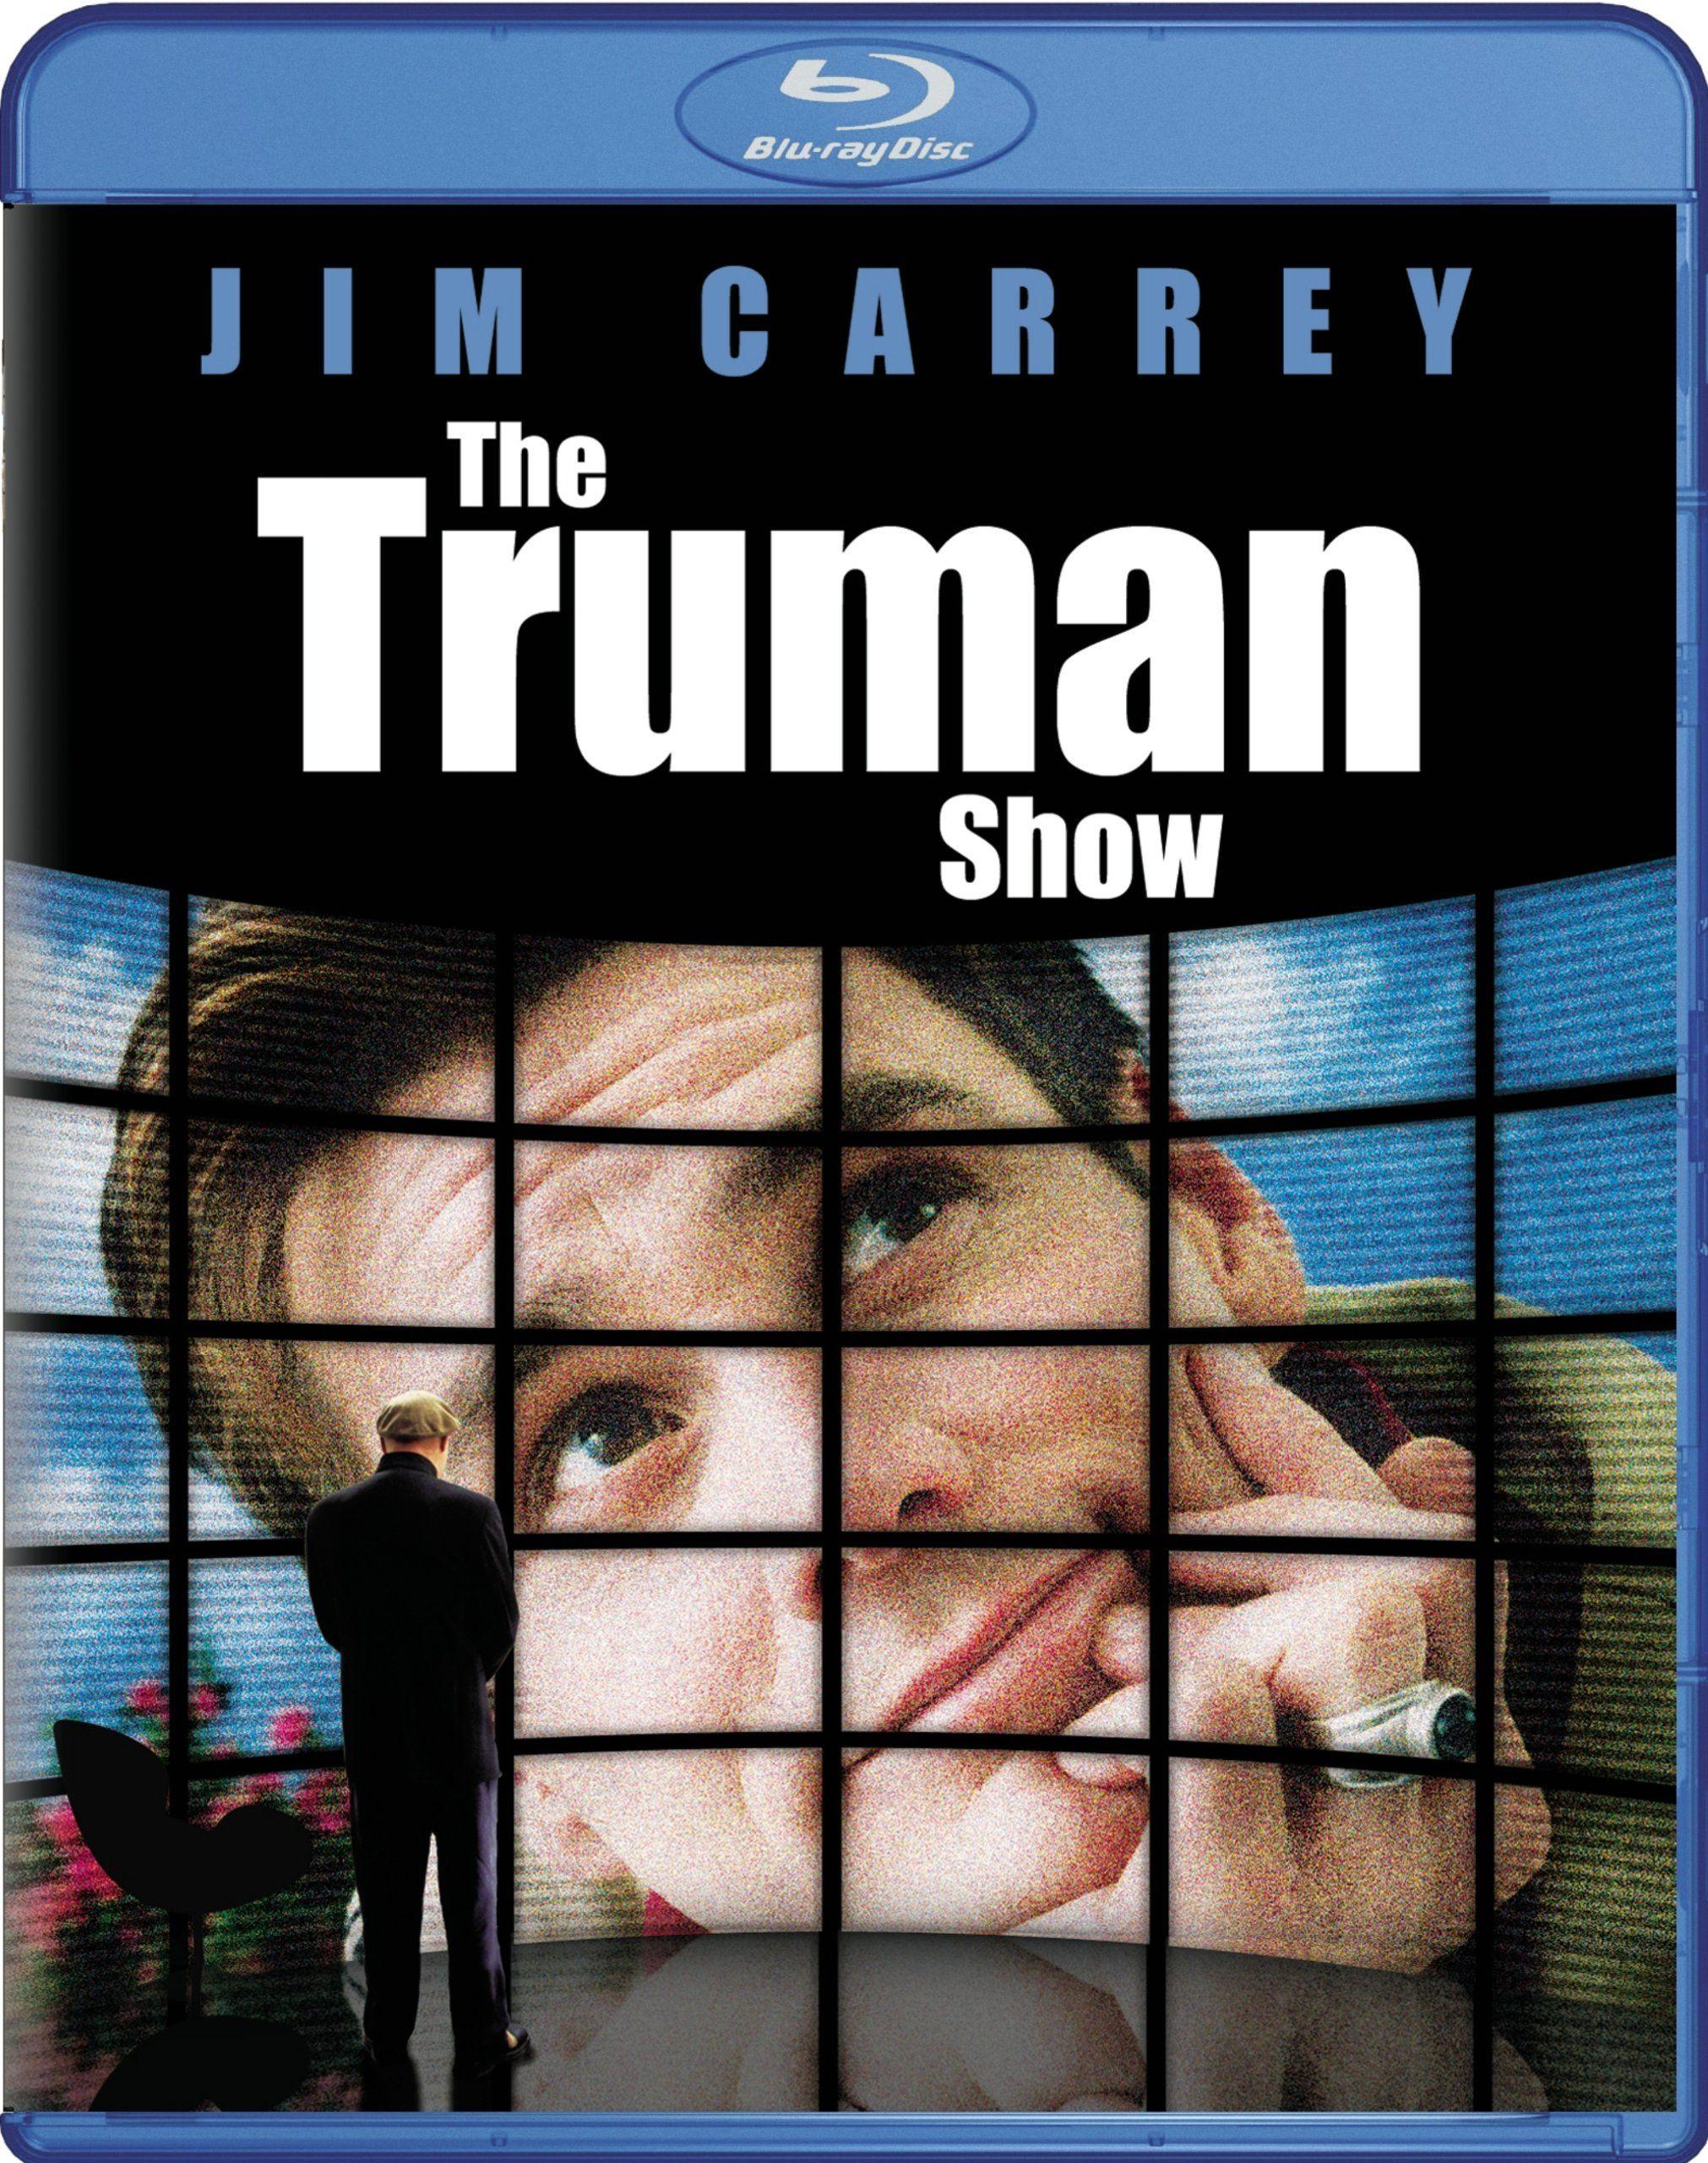 An insurance salesman, Truman Burbank, begins to doubt